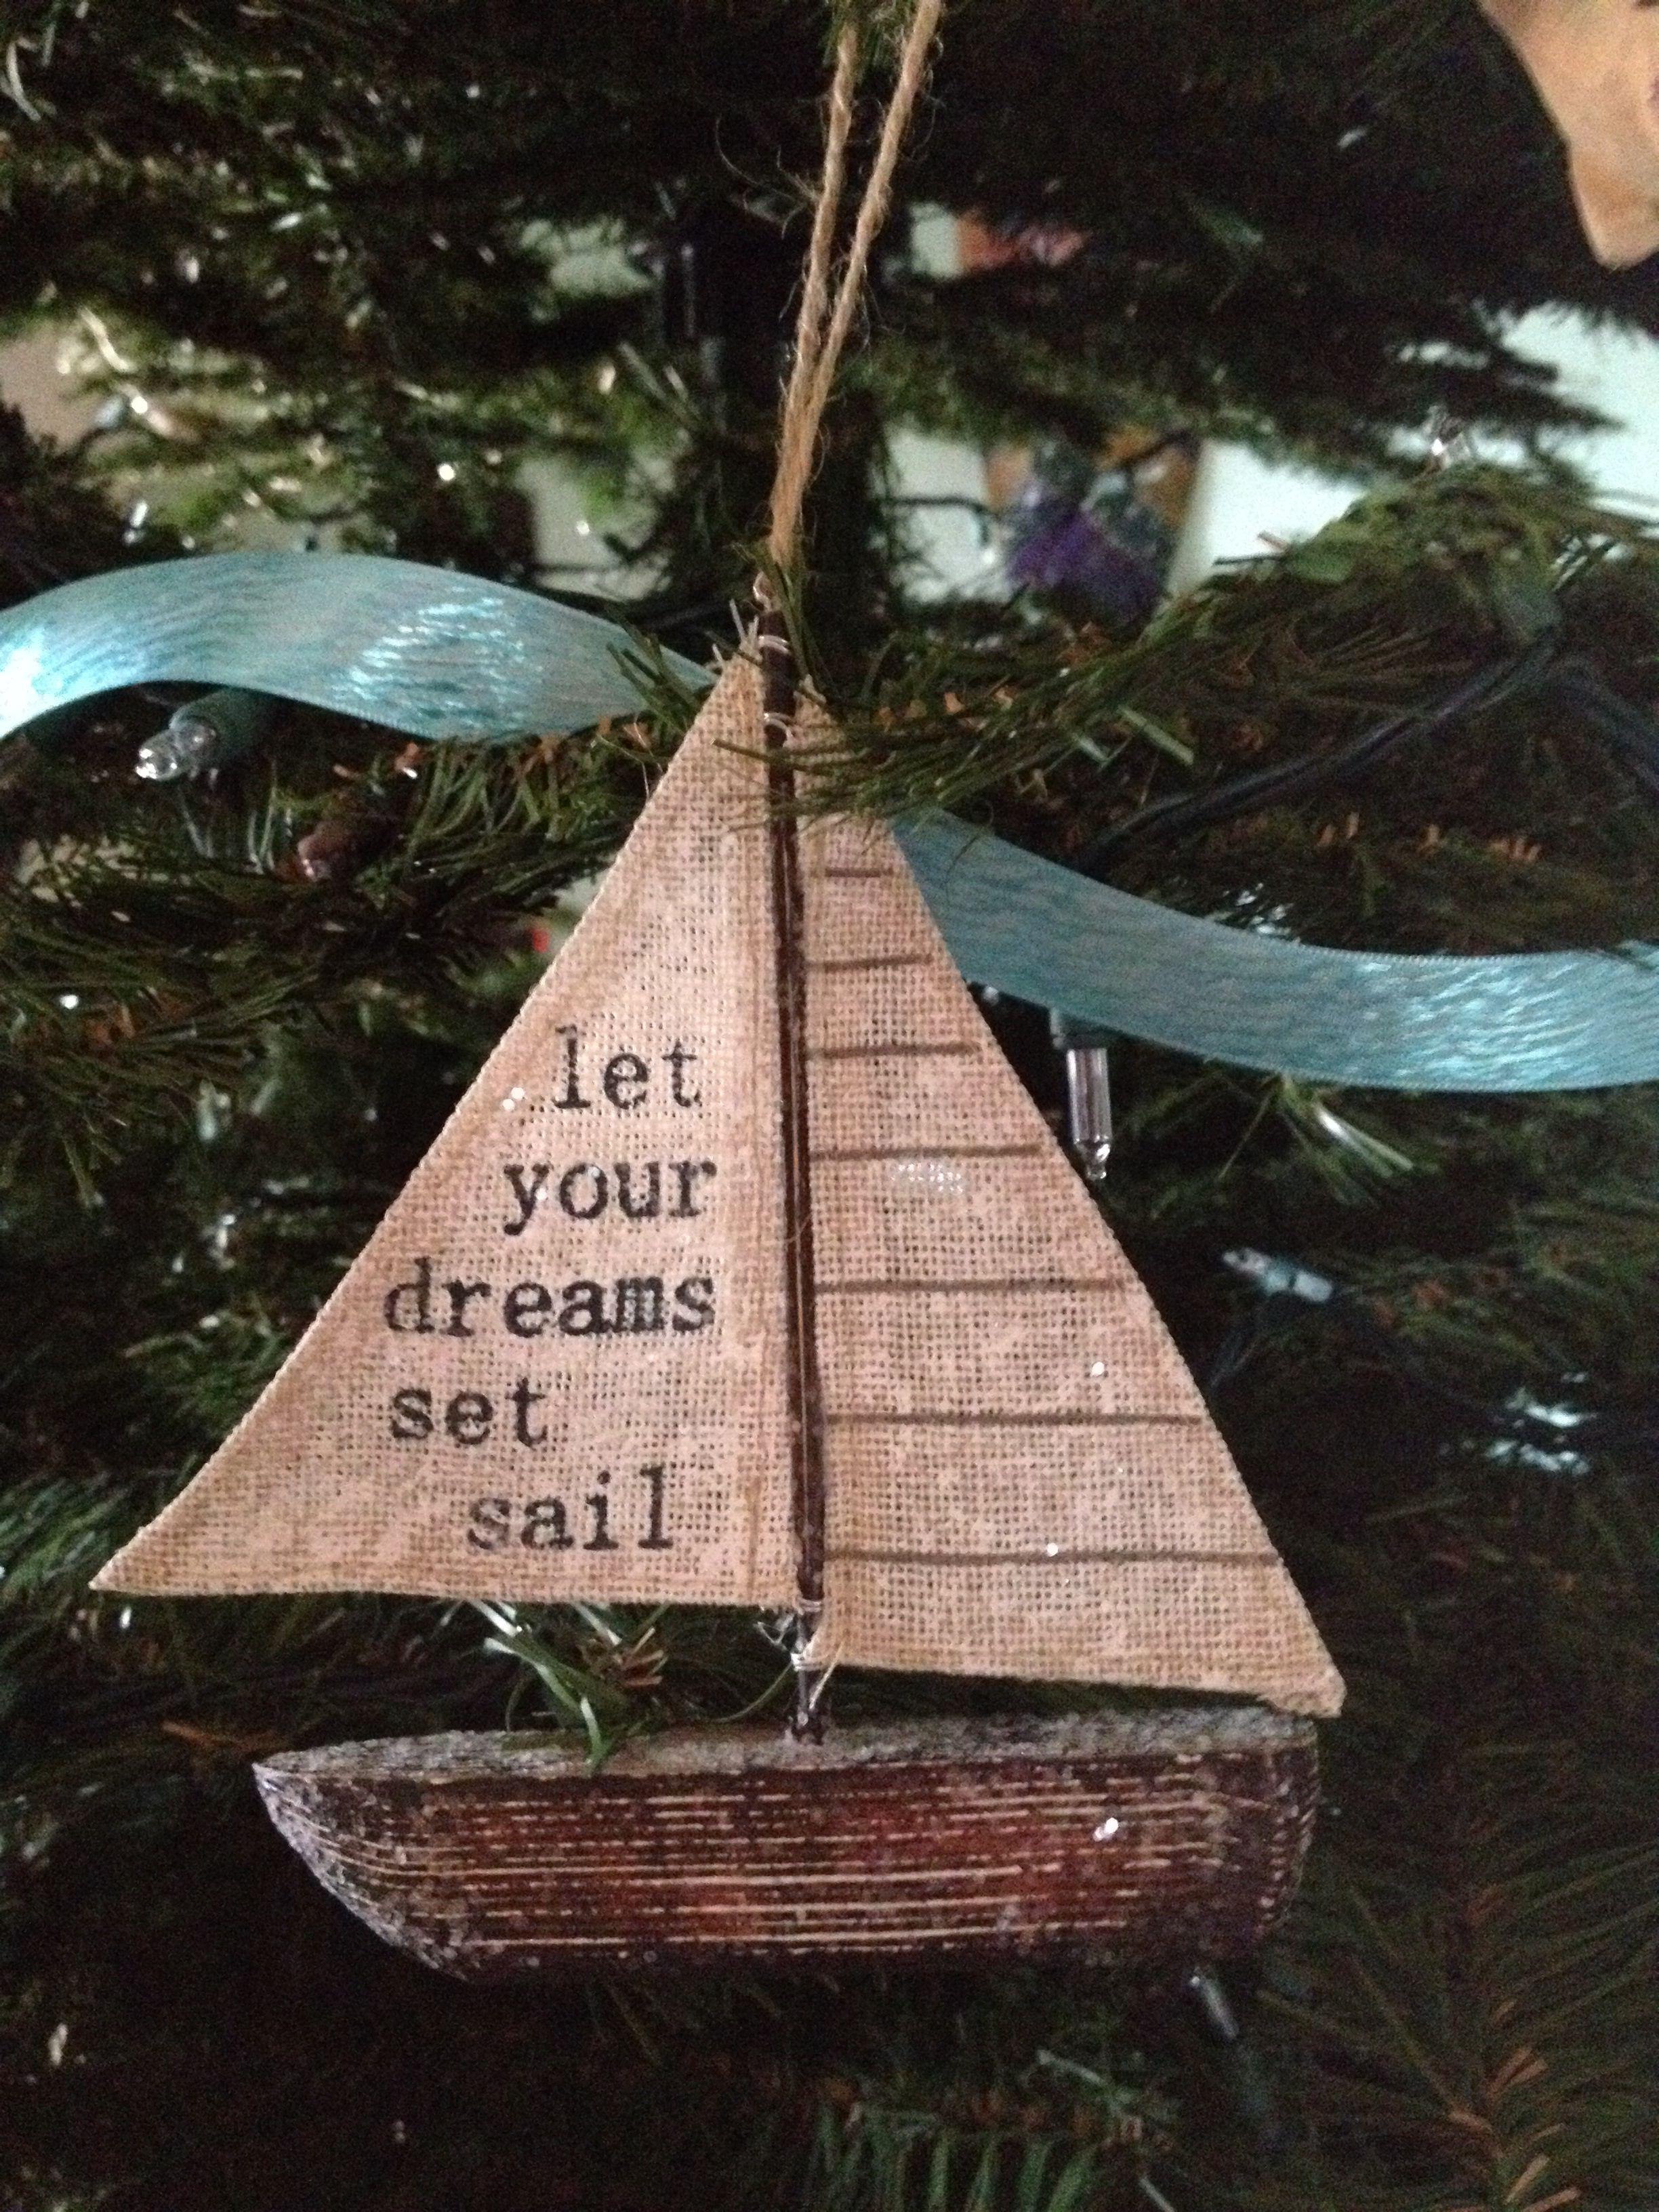 Let Your Dreams Set Sail Sailboat Ornament On My Coastal Christmas Tree Coastal Christmas Tree Coastal Christmas Decor Beach Christmas Decorations